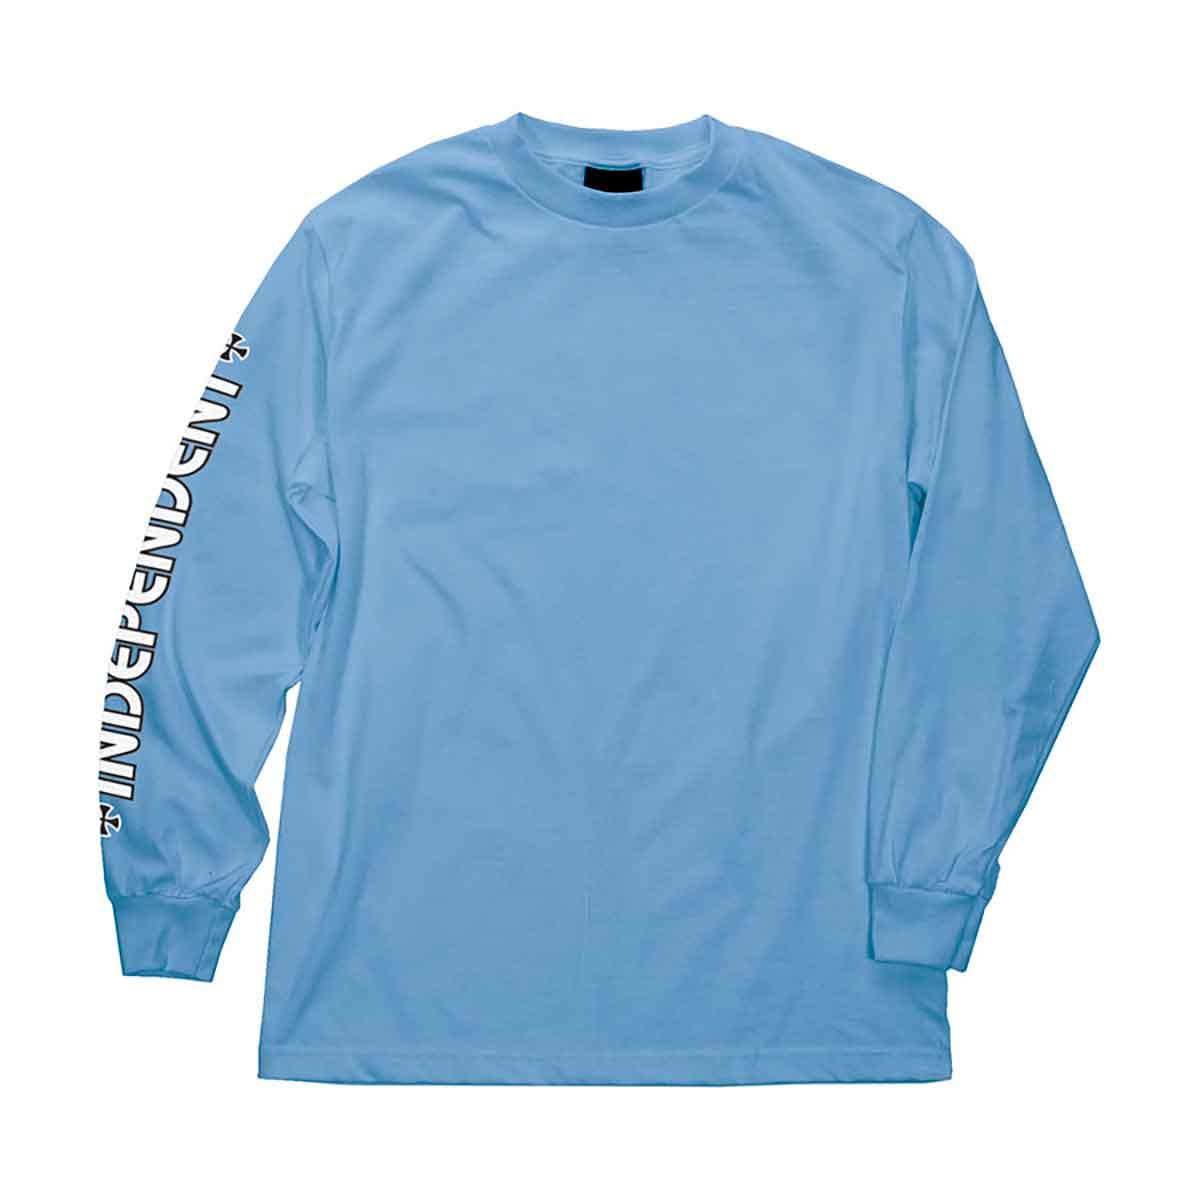 Independent Trucks OGBC LOGO Skateboard Shirt CAROLINA BLUE MEDIUM